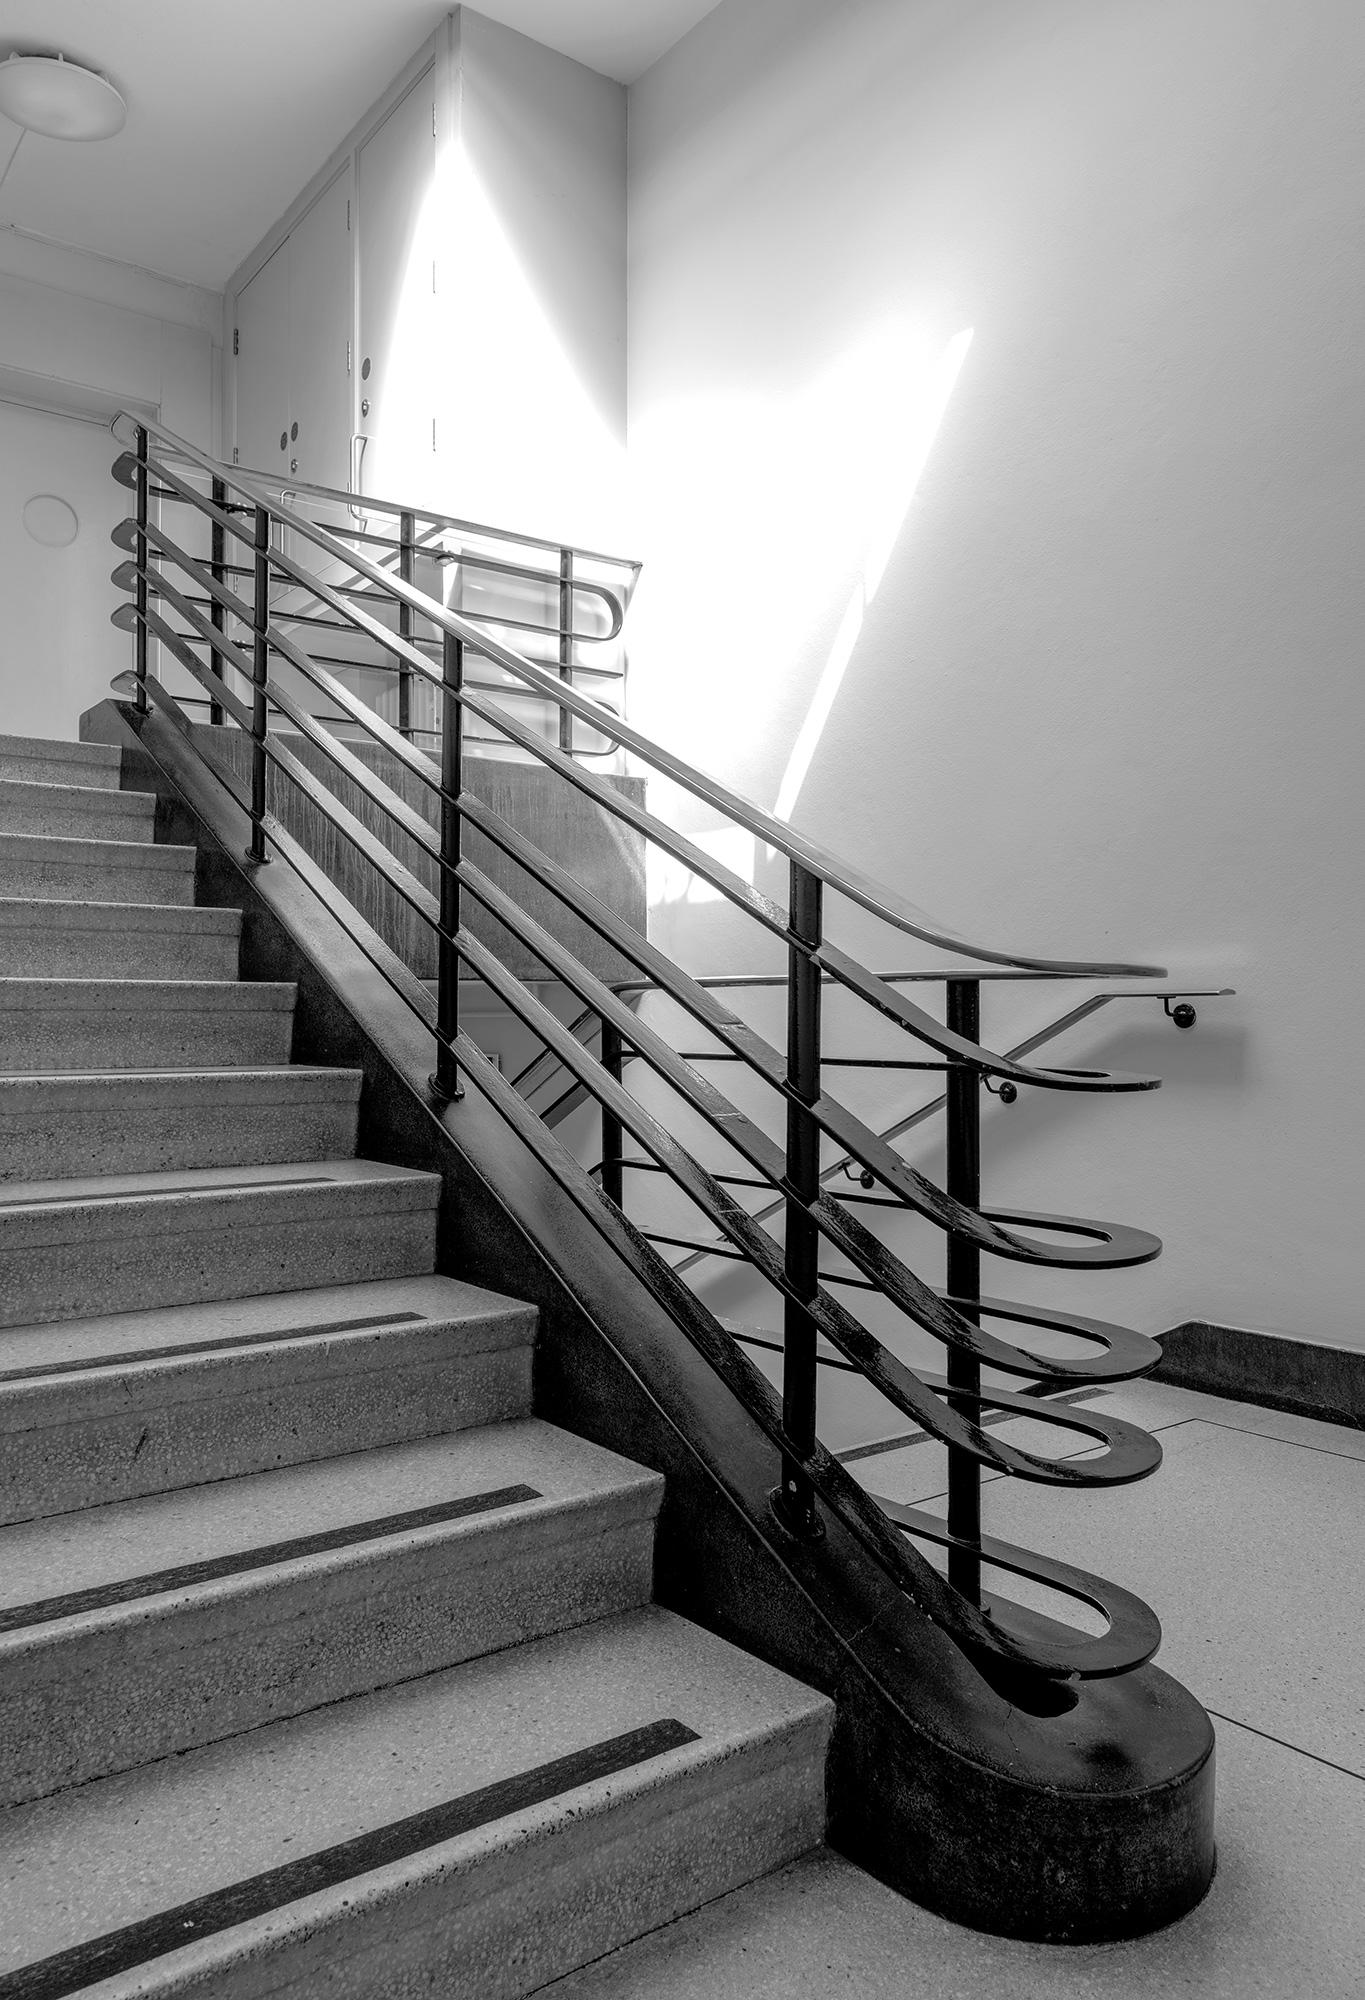 Tunbridge Wells Assembly Halls